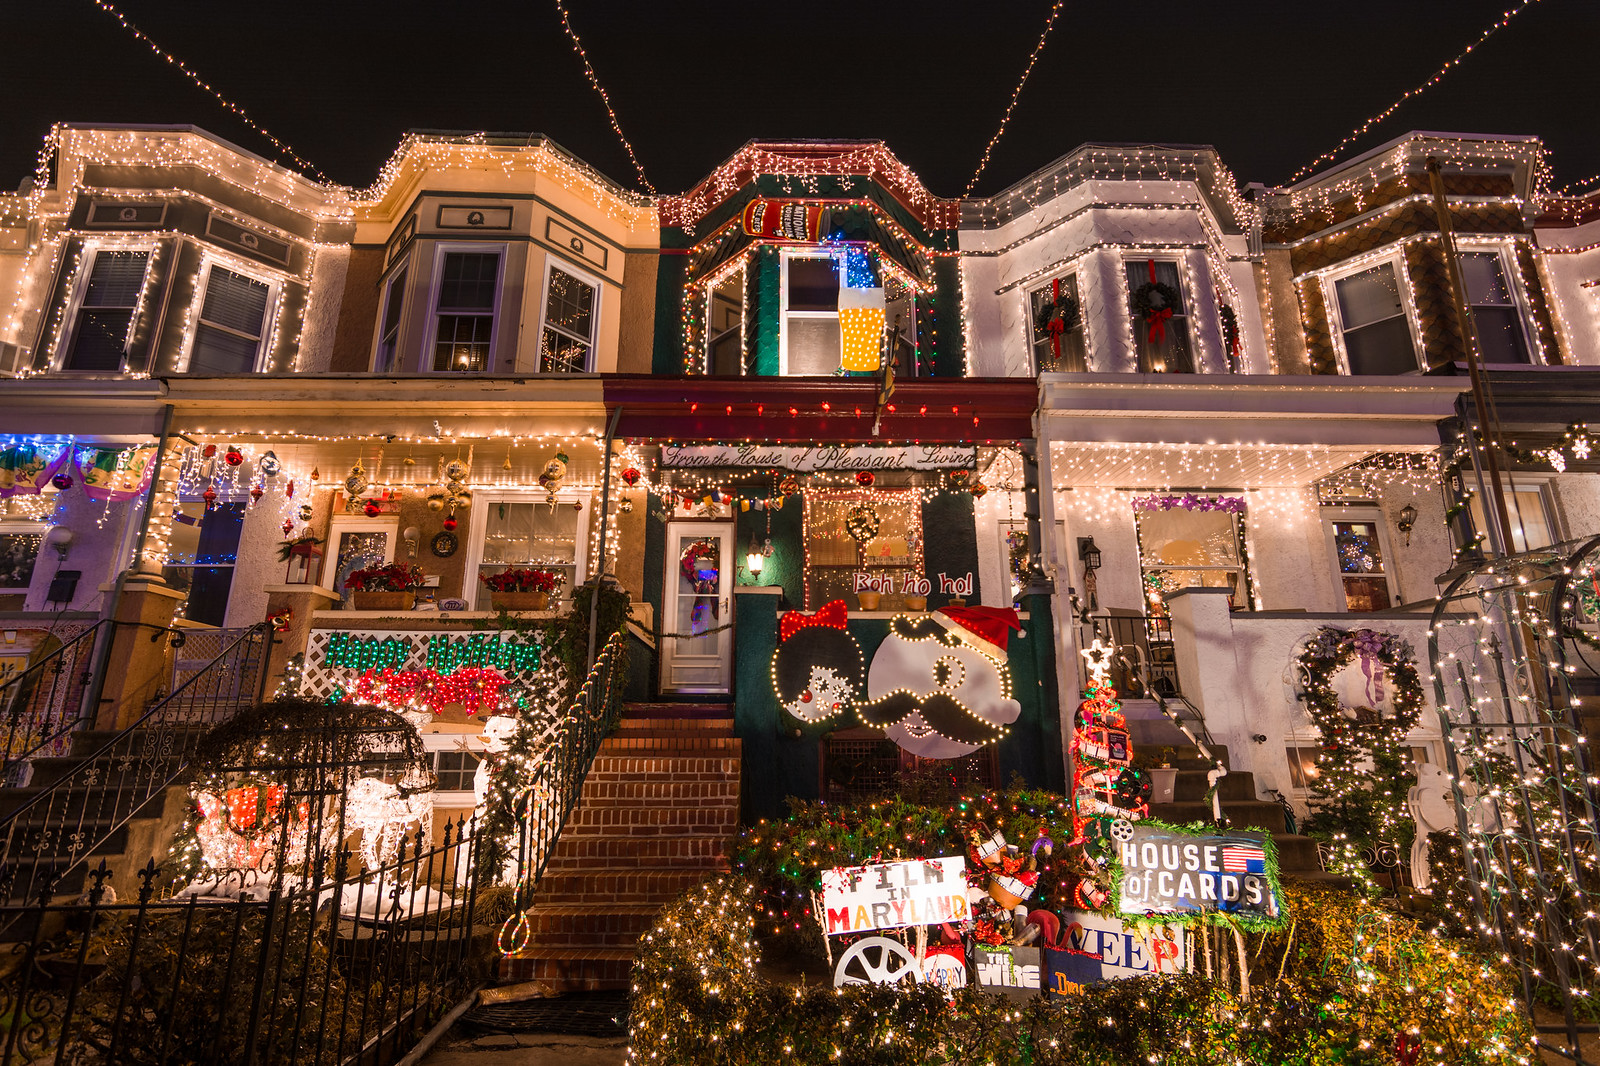 Baltimore's 34th Street